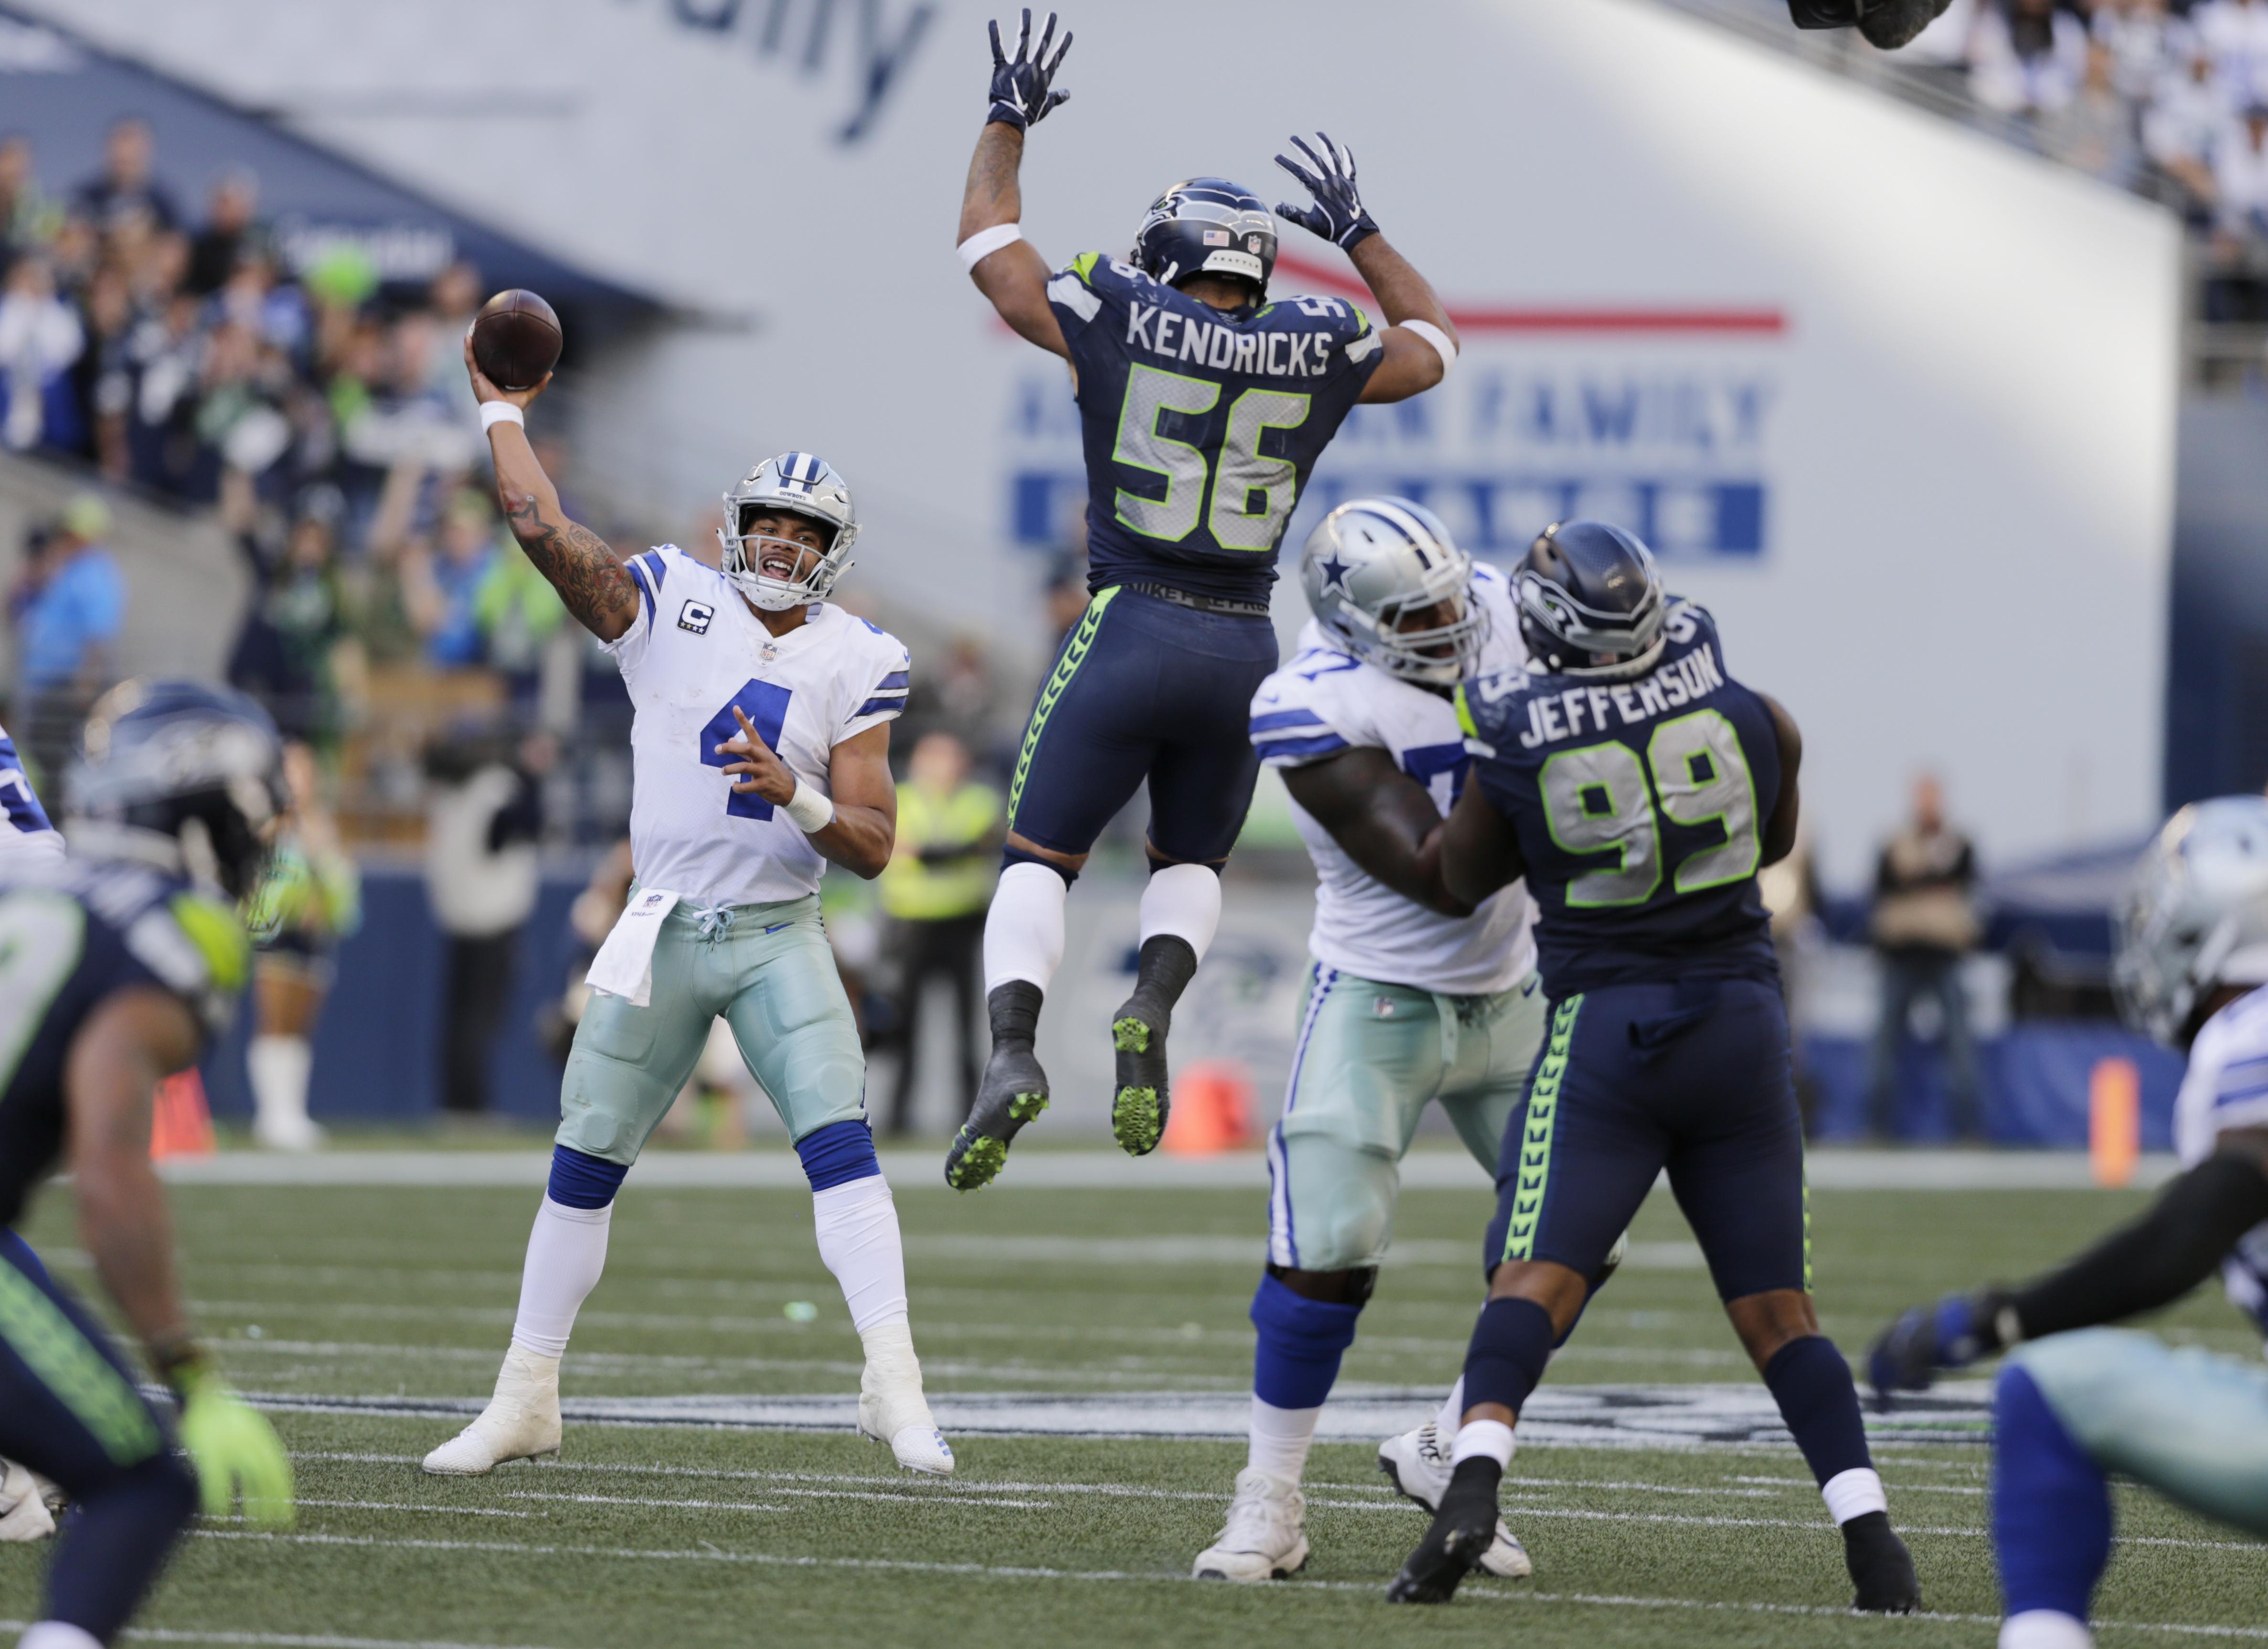 NFL suspends Seahawks LB Mychal Kendricks indefinitely